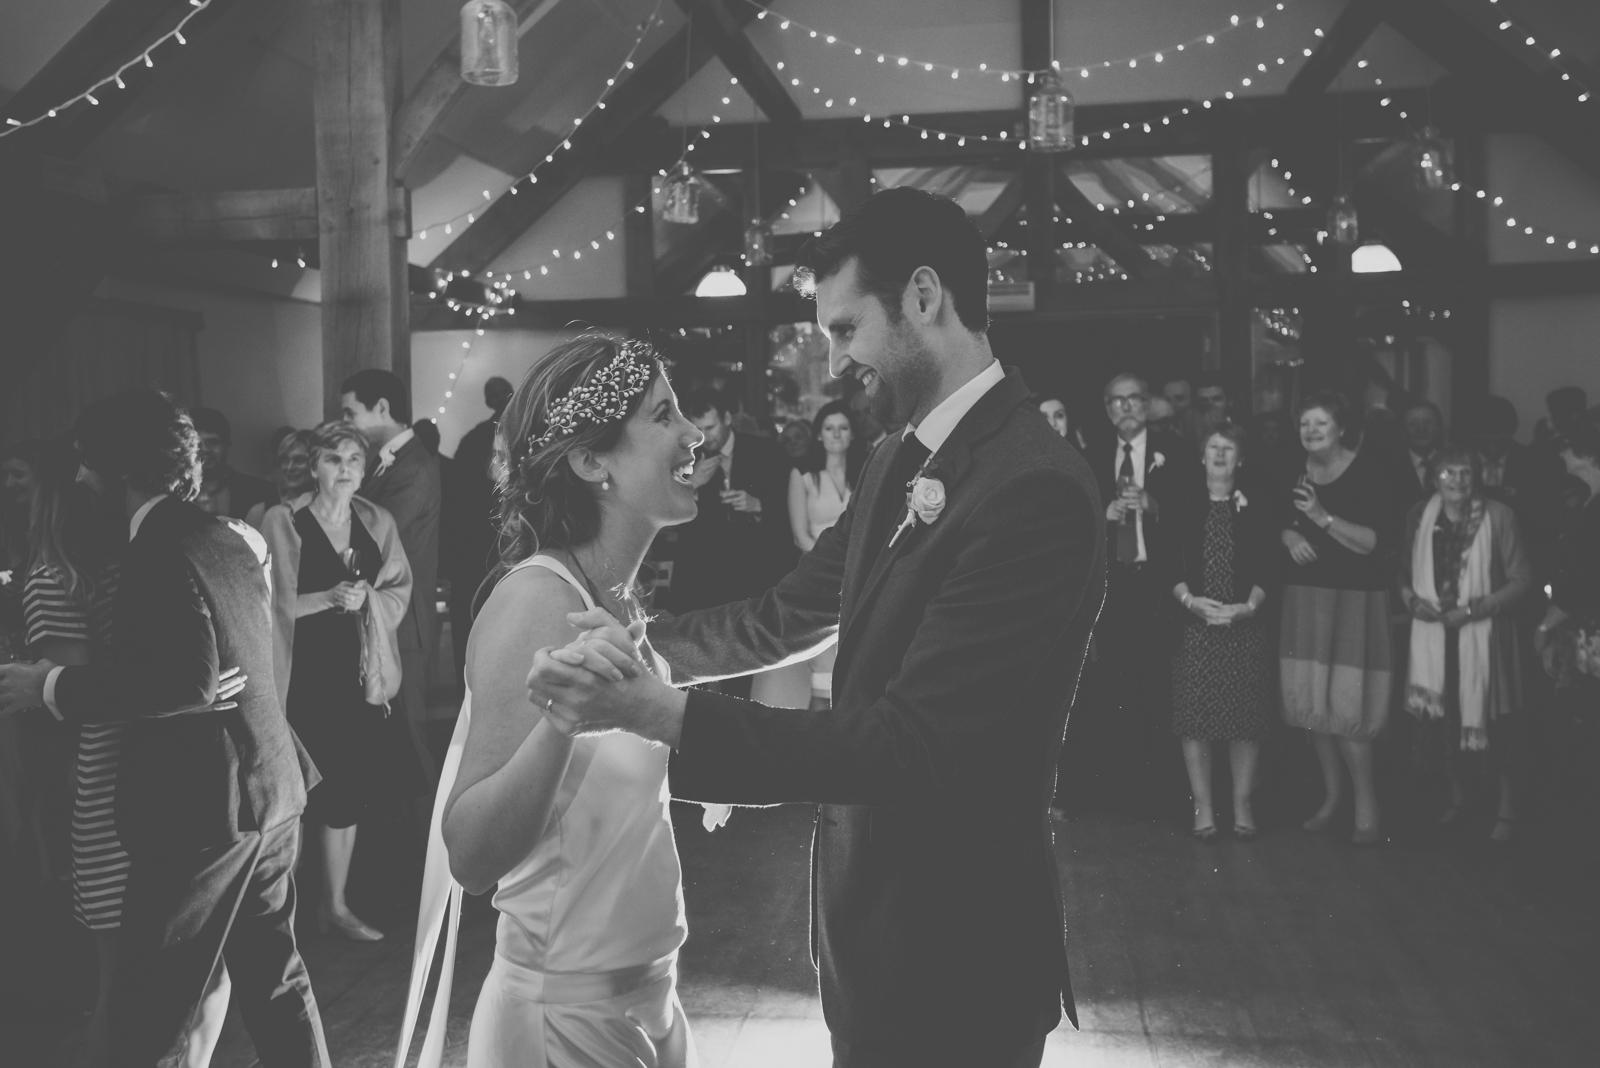 nancarrow-wedding-photography-163.jpg